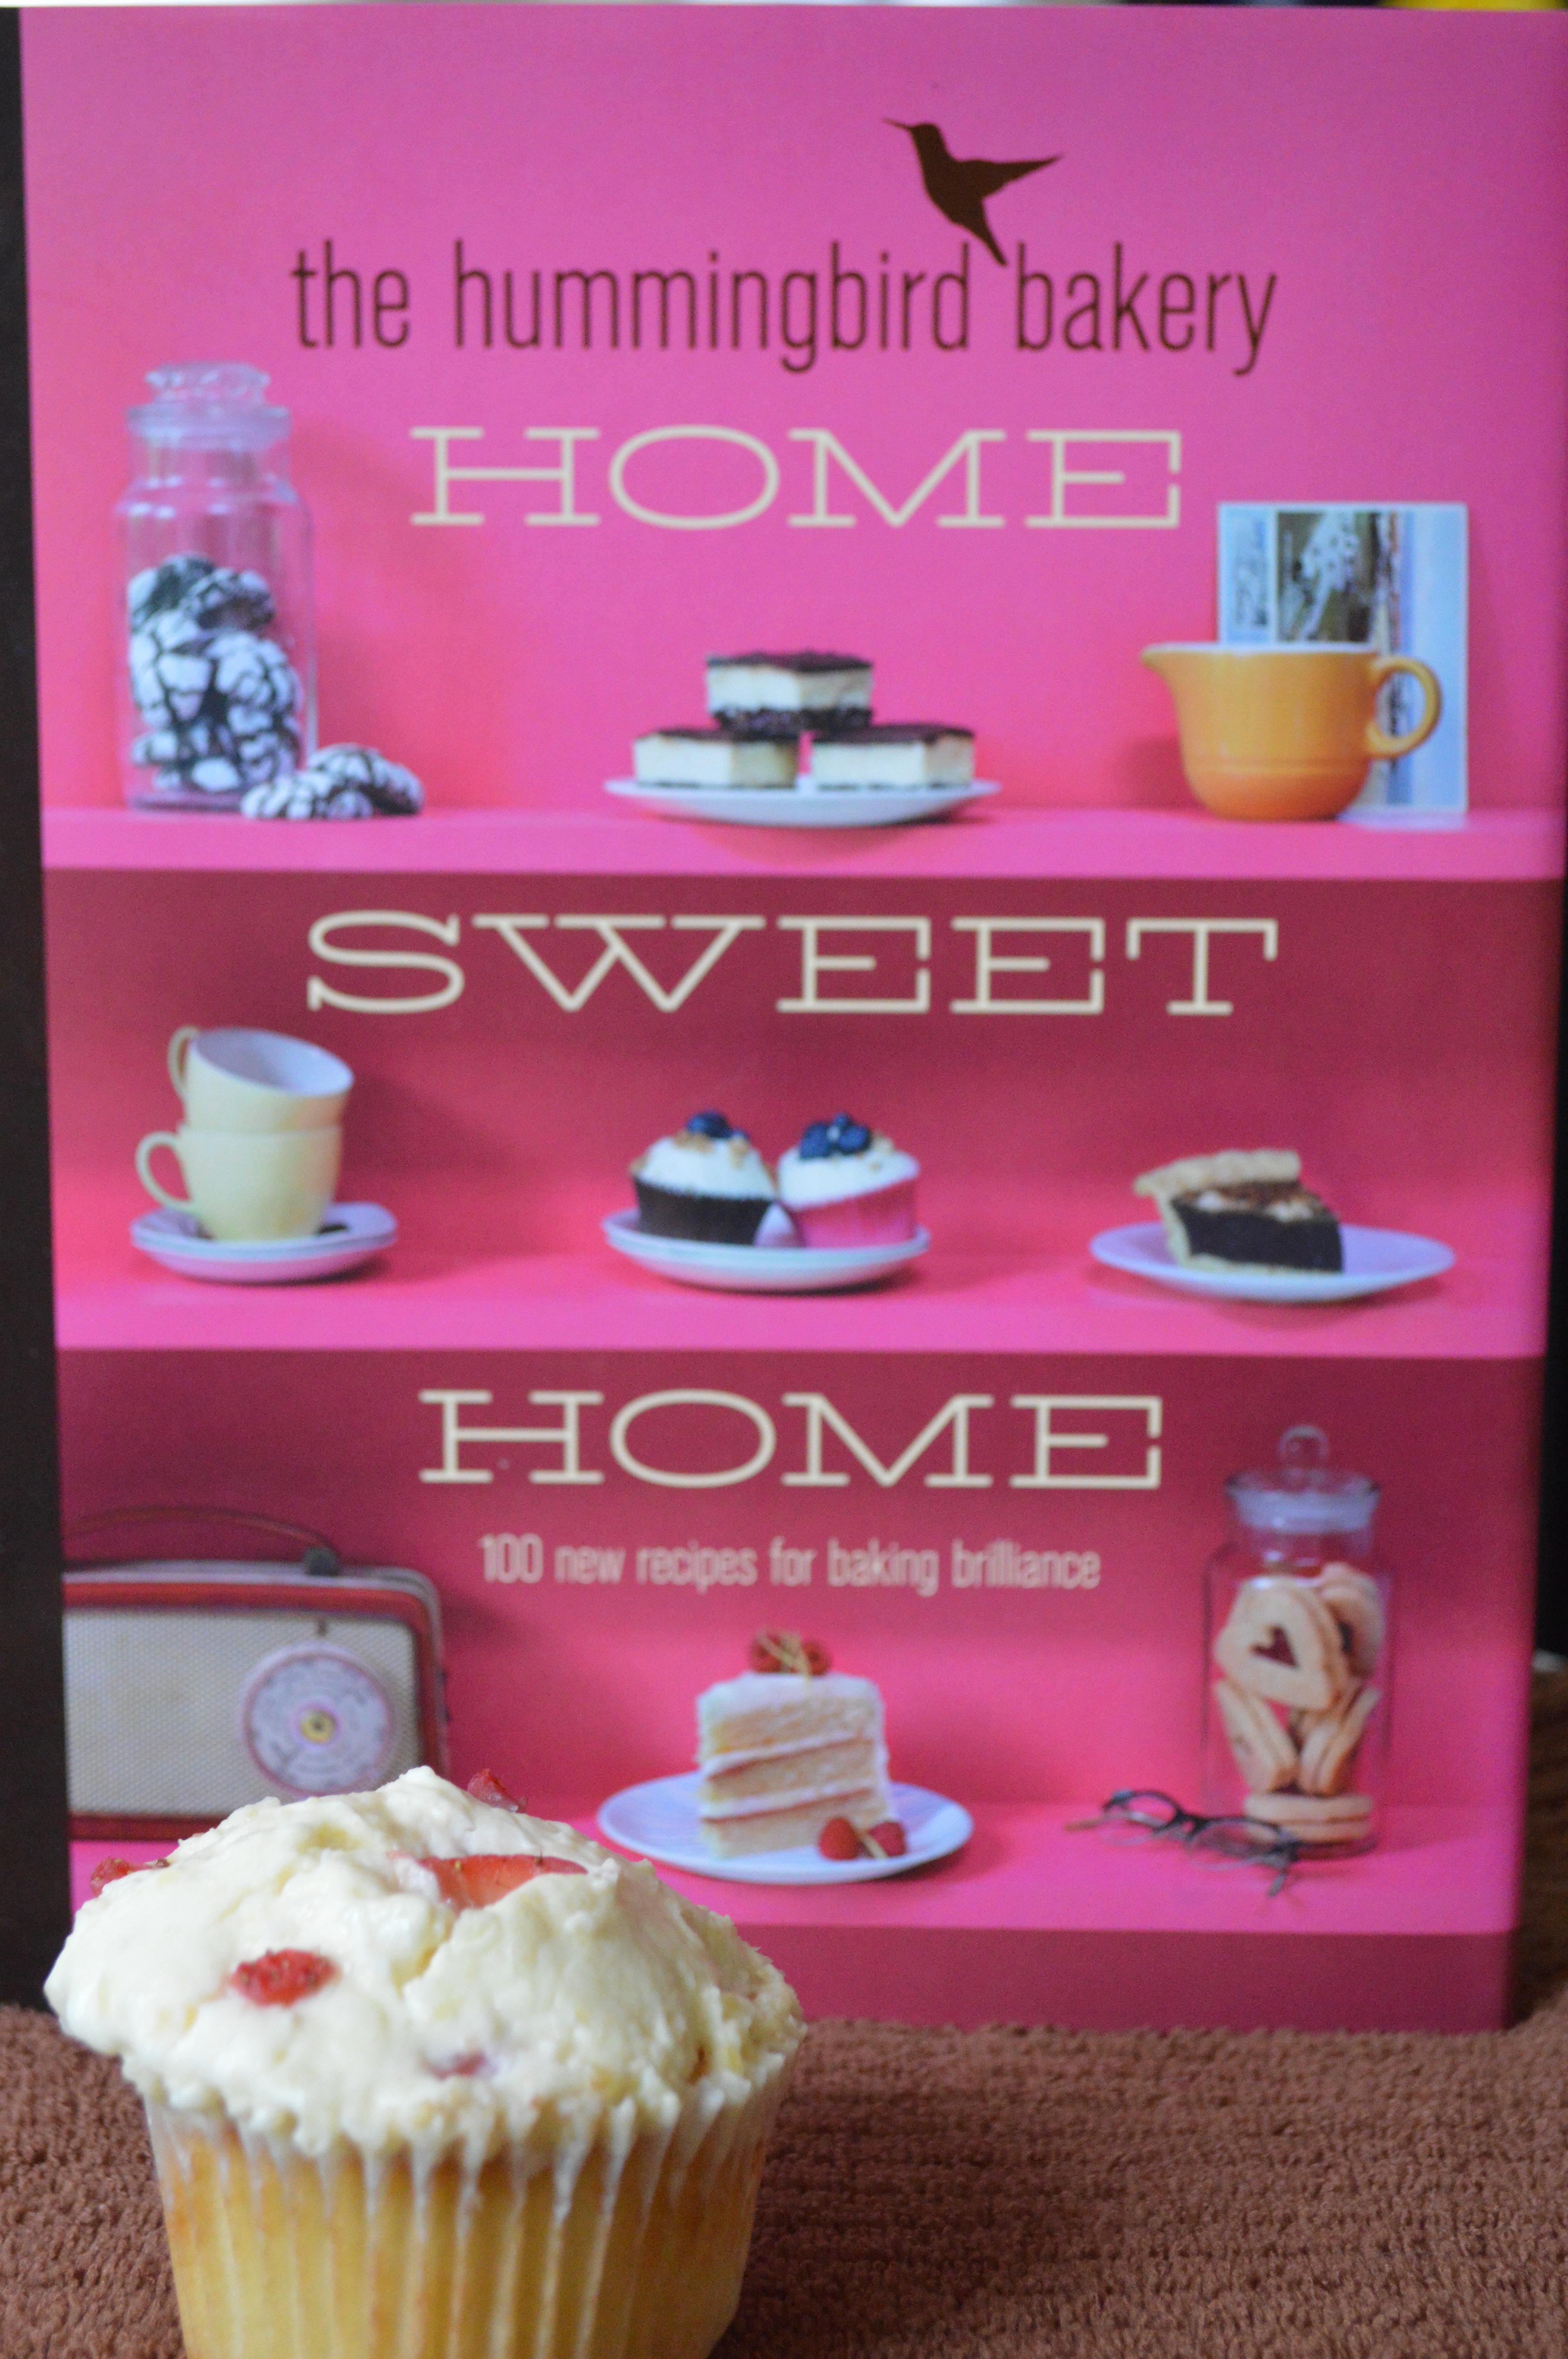 Hummingbird bakery recipes home sweet home